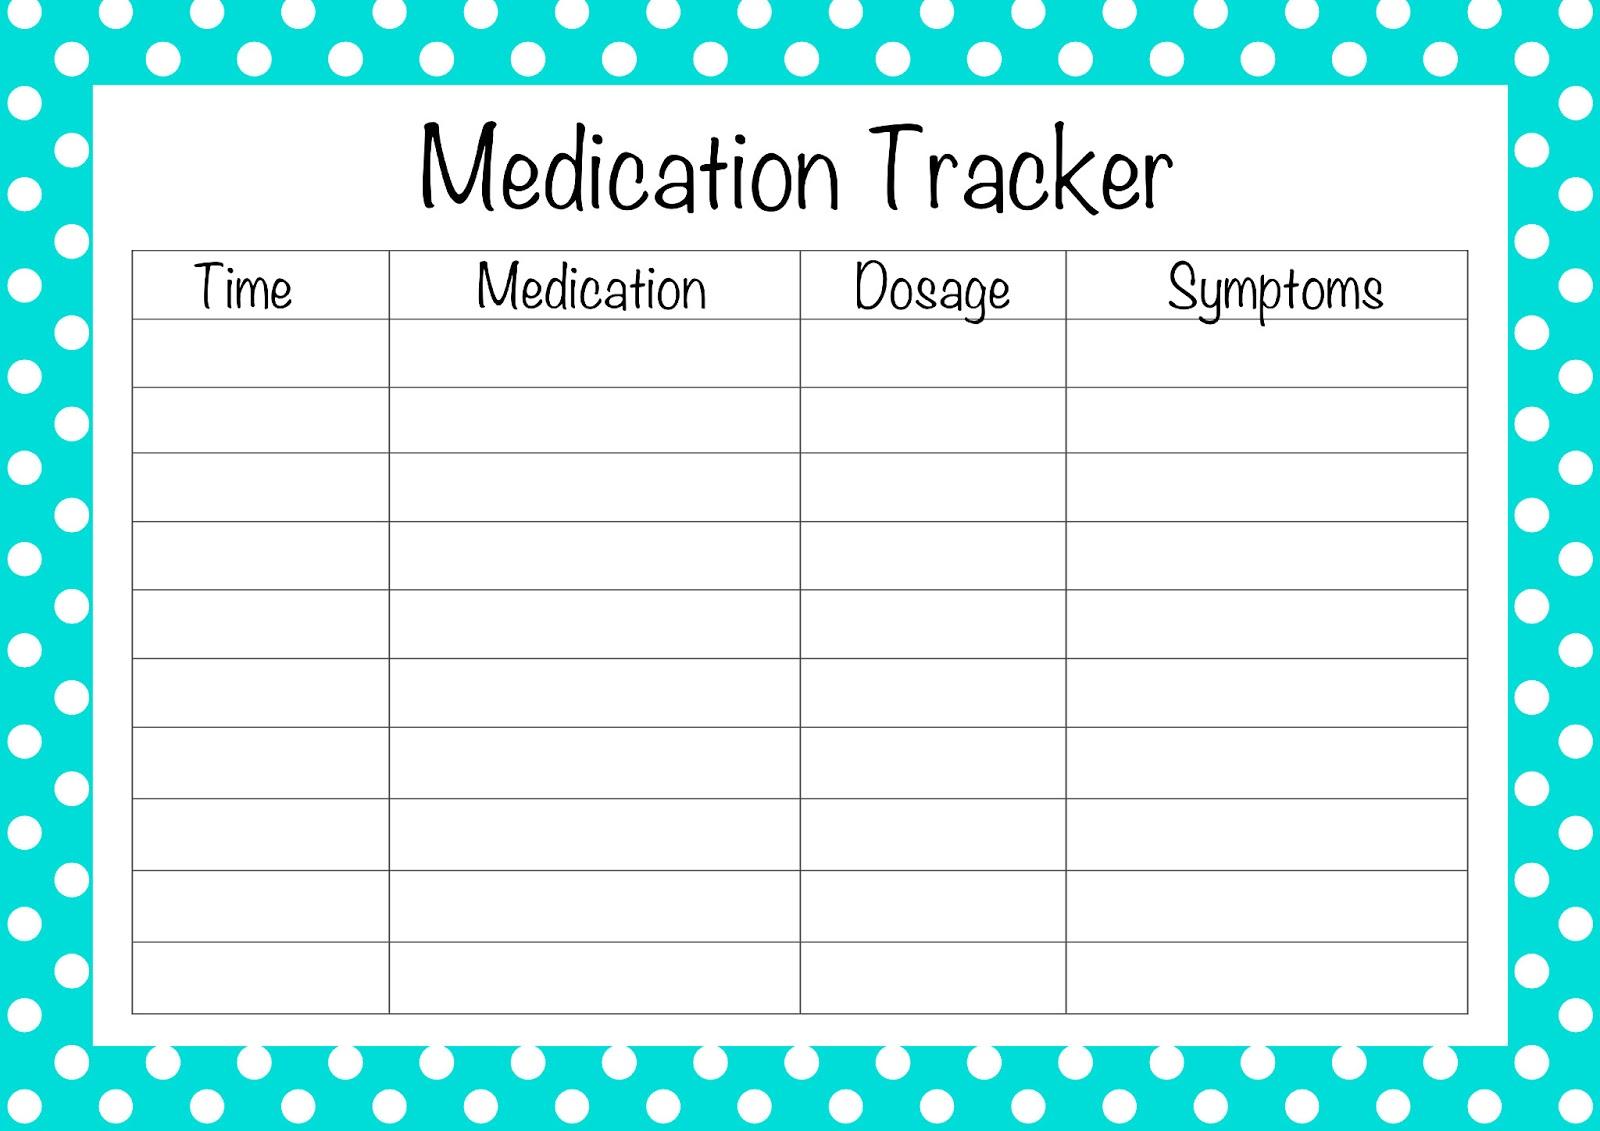 Medication List Template. my medicine list. displaying 20 gt ...